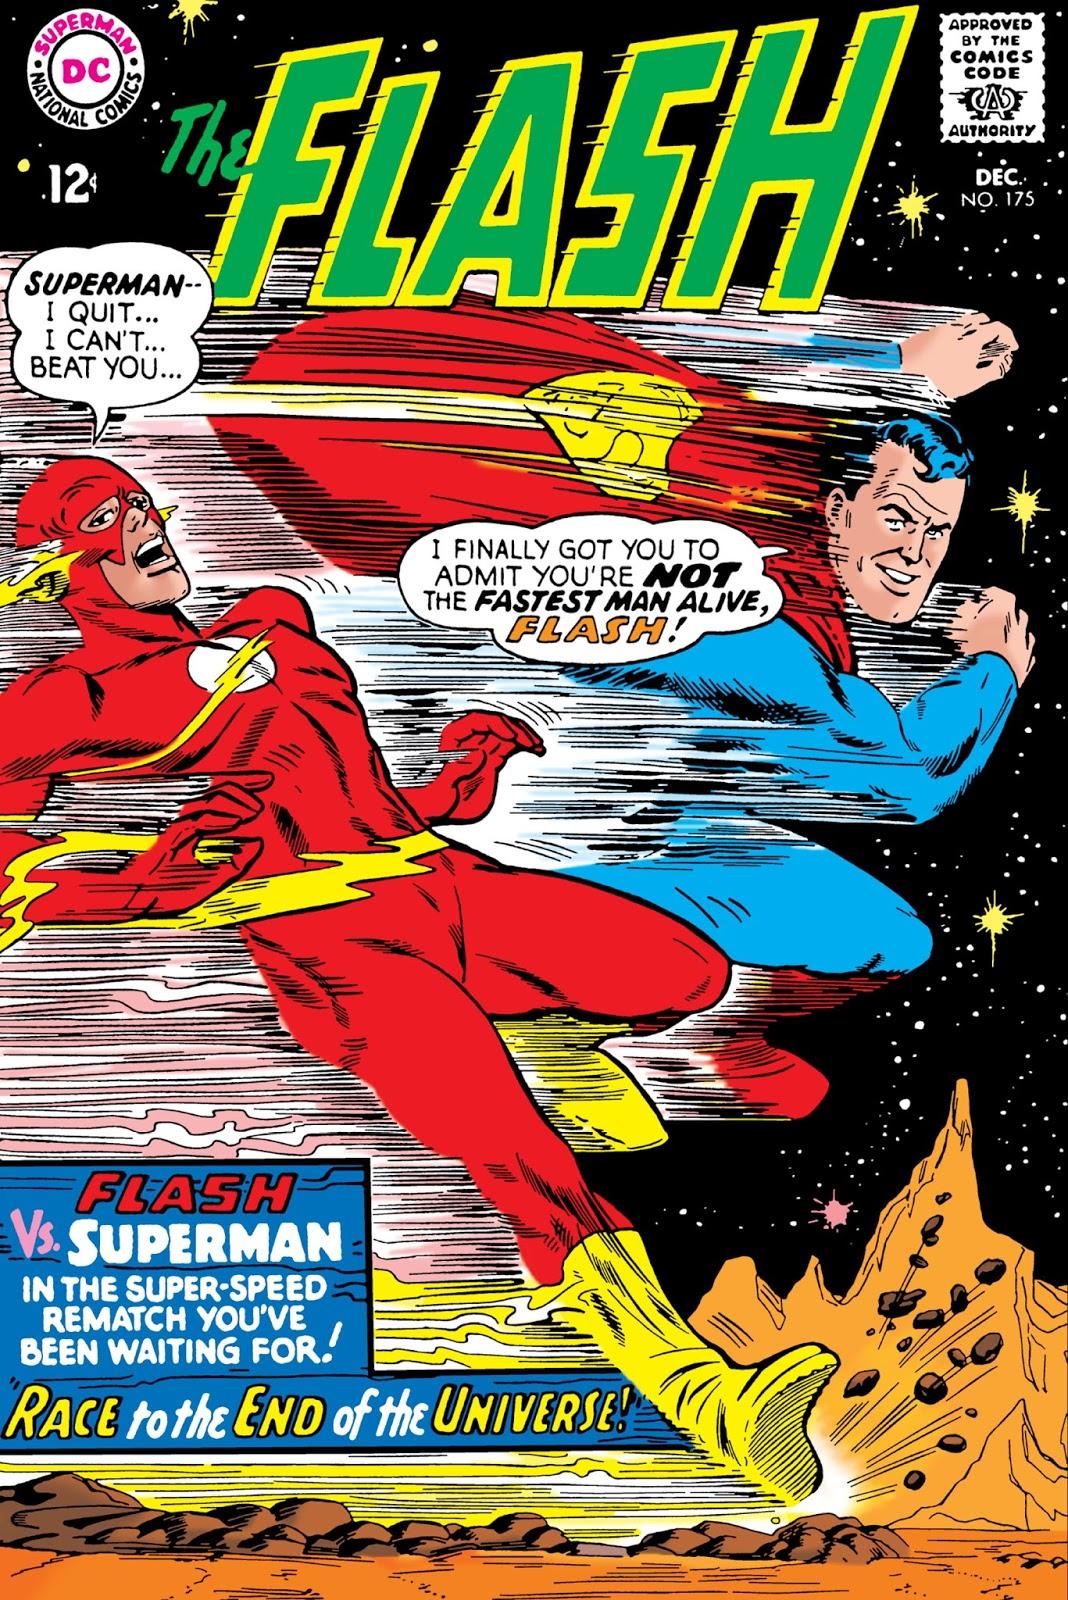 COMIC BOOK FAN AND LOVER: COMBATES CLÁSICOS: SUPERMAN vs FLASH